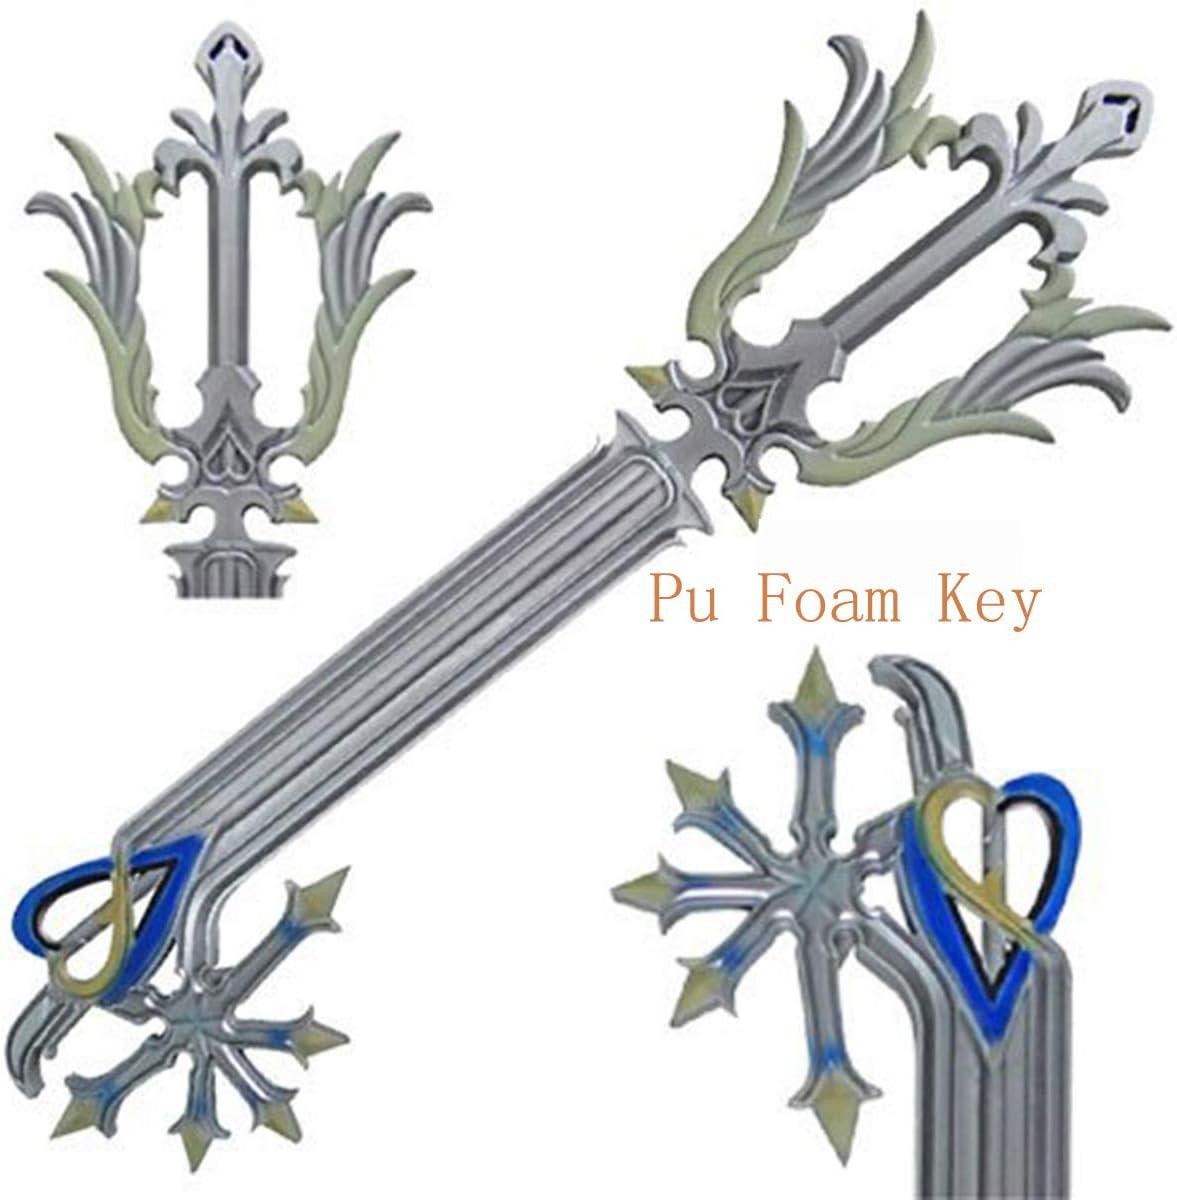 KXR Kingdom Hearts Mickey Keyblade Safe Soft PU 34.6 Length Material Kingdom Hearts Sora Keyblade Katana Ep/ée Sabre Repliksword